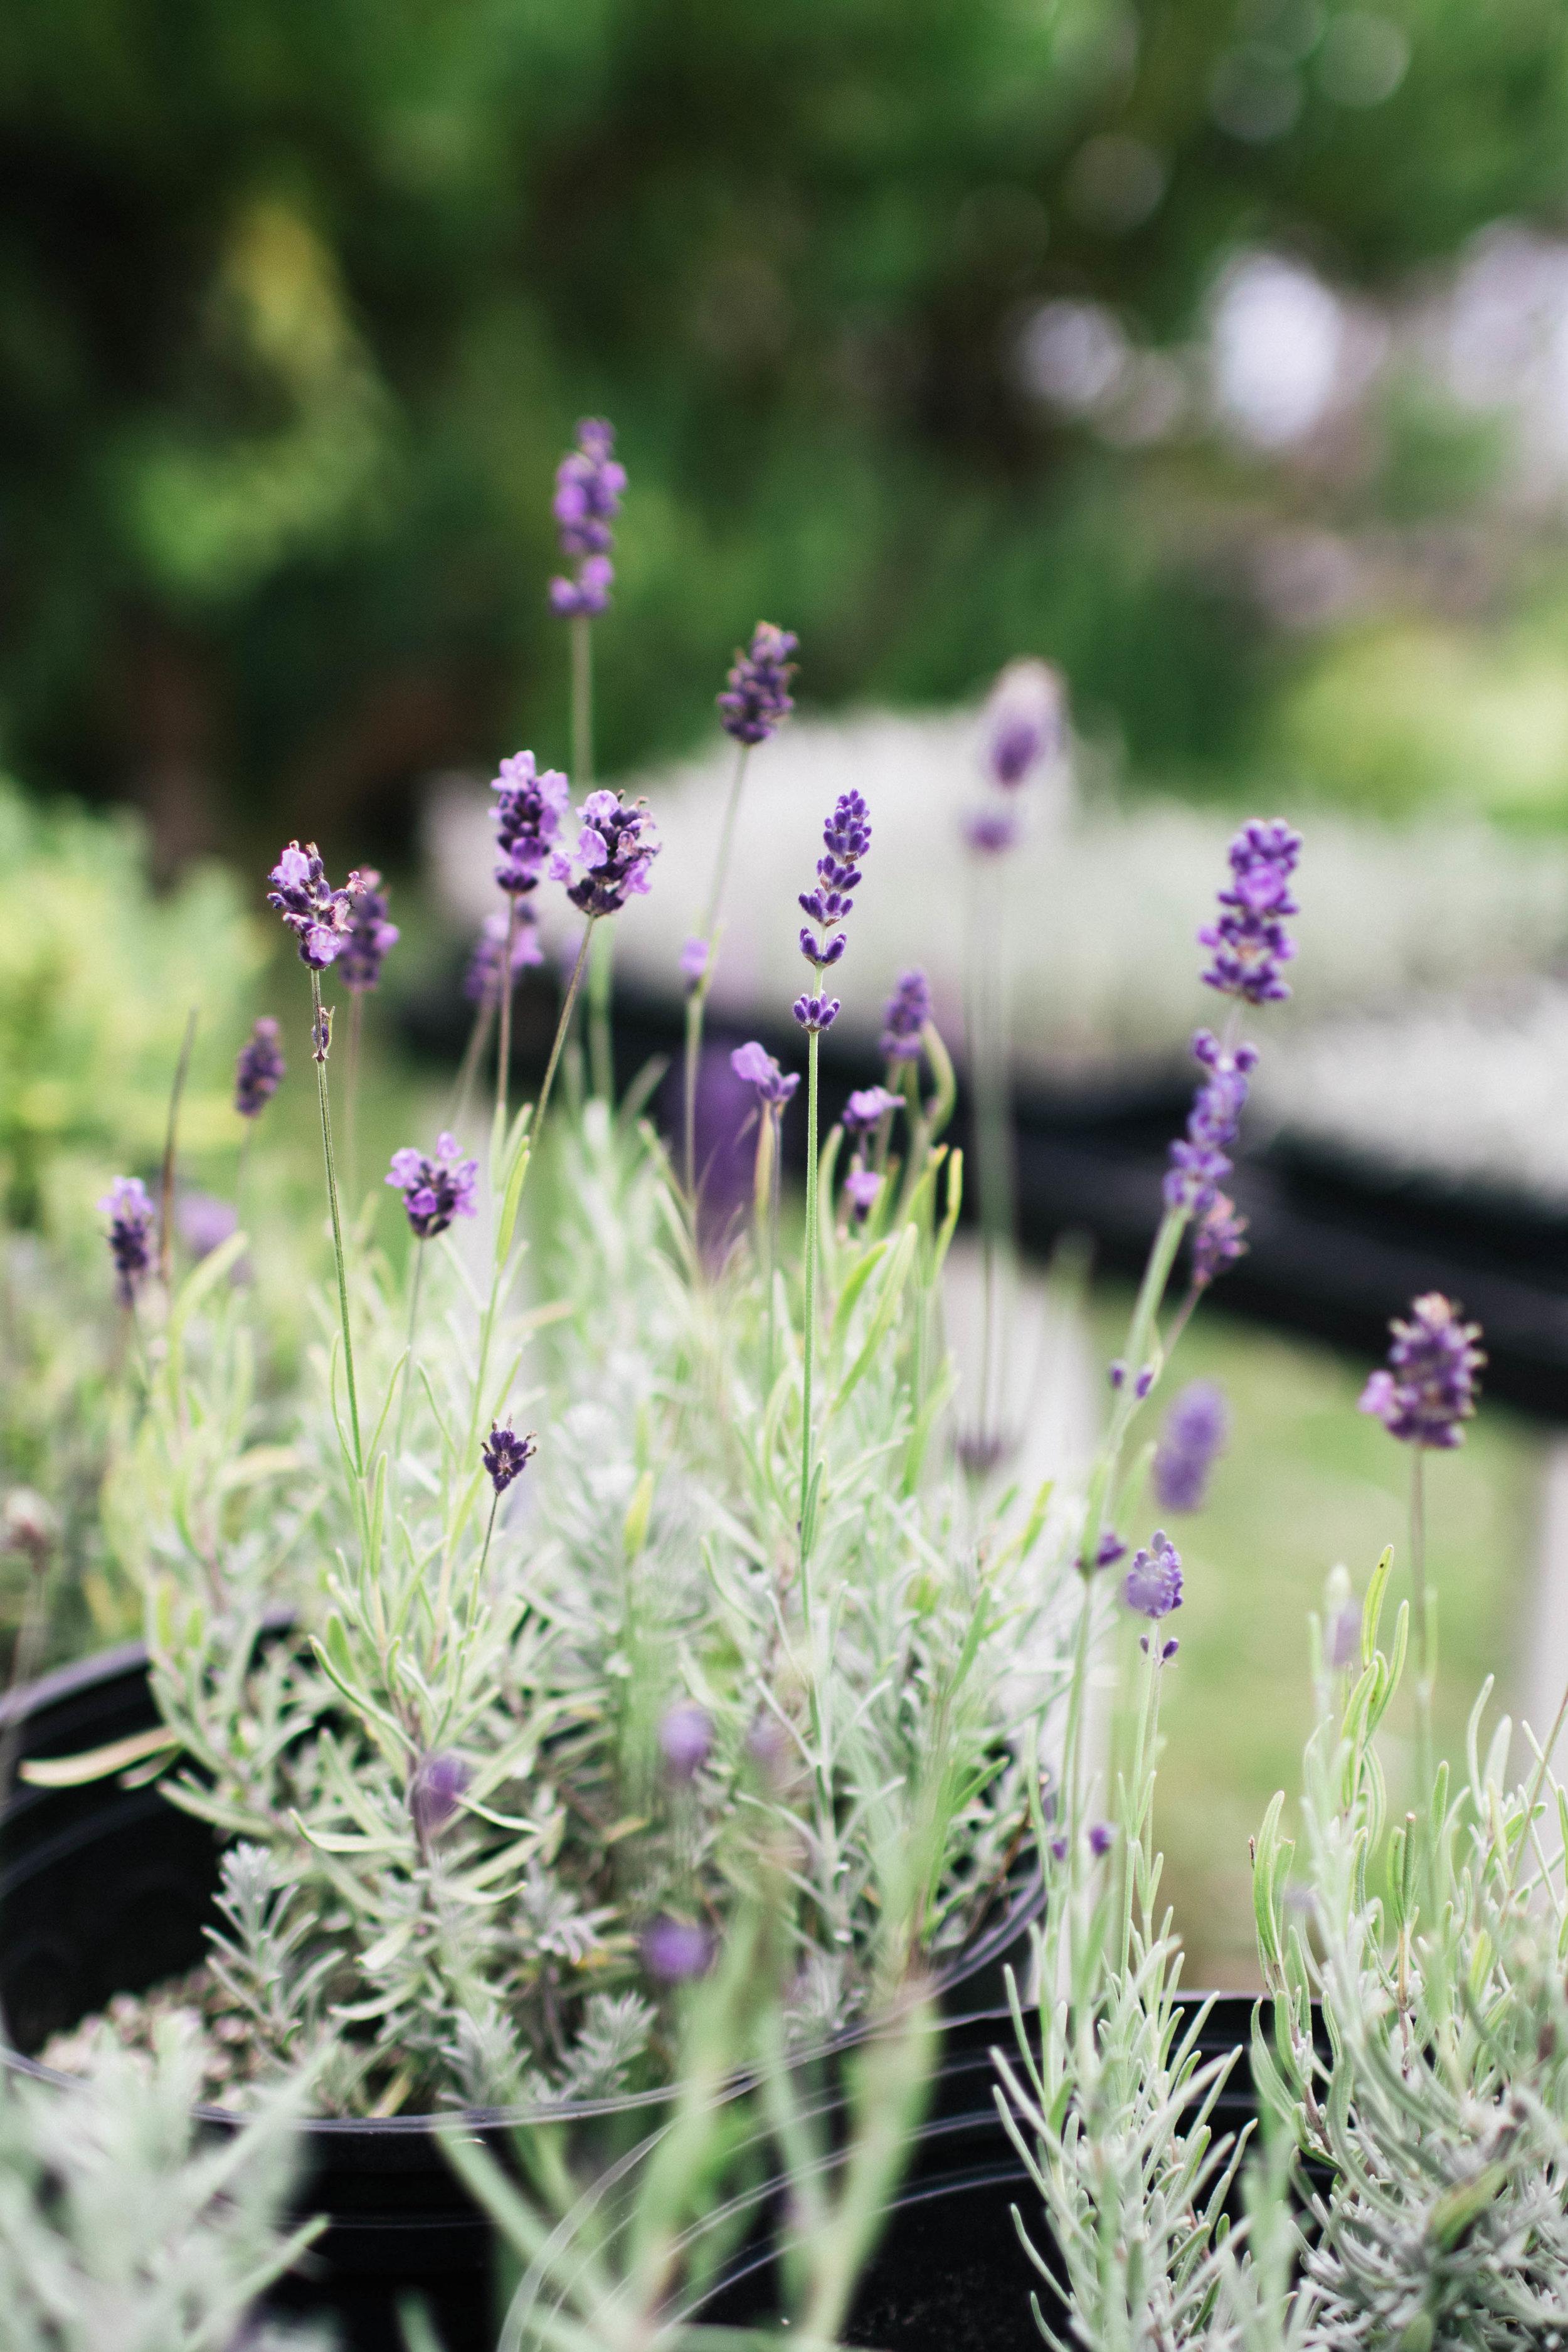 alii-kula-lavender-farm-maui-photo-by-samantha-look.jpg